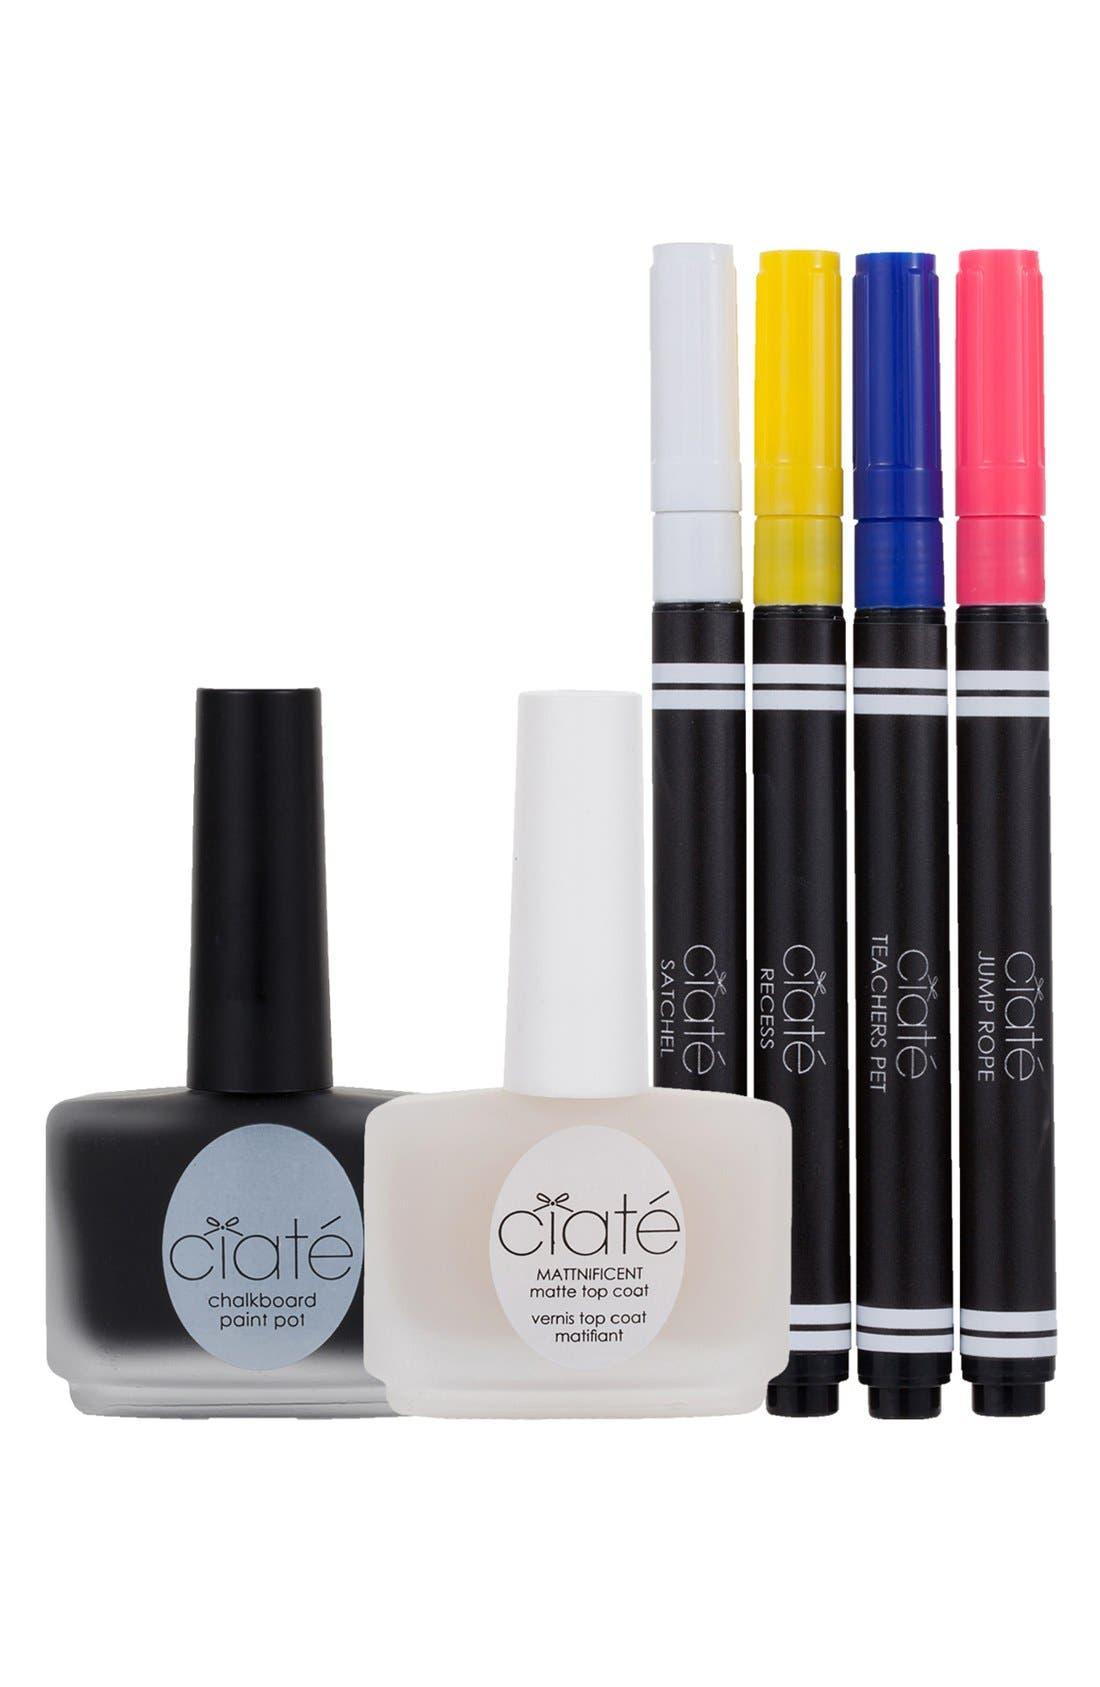 'Chalkboard' Manicure Set,                             Main thumbnail 1, color,                             650